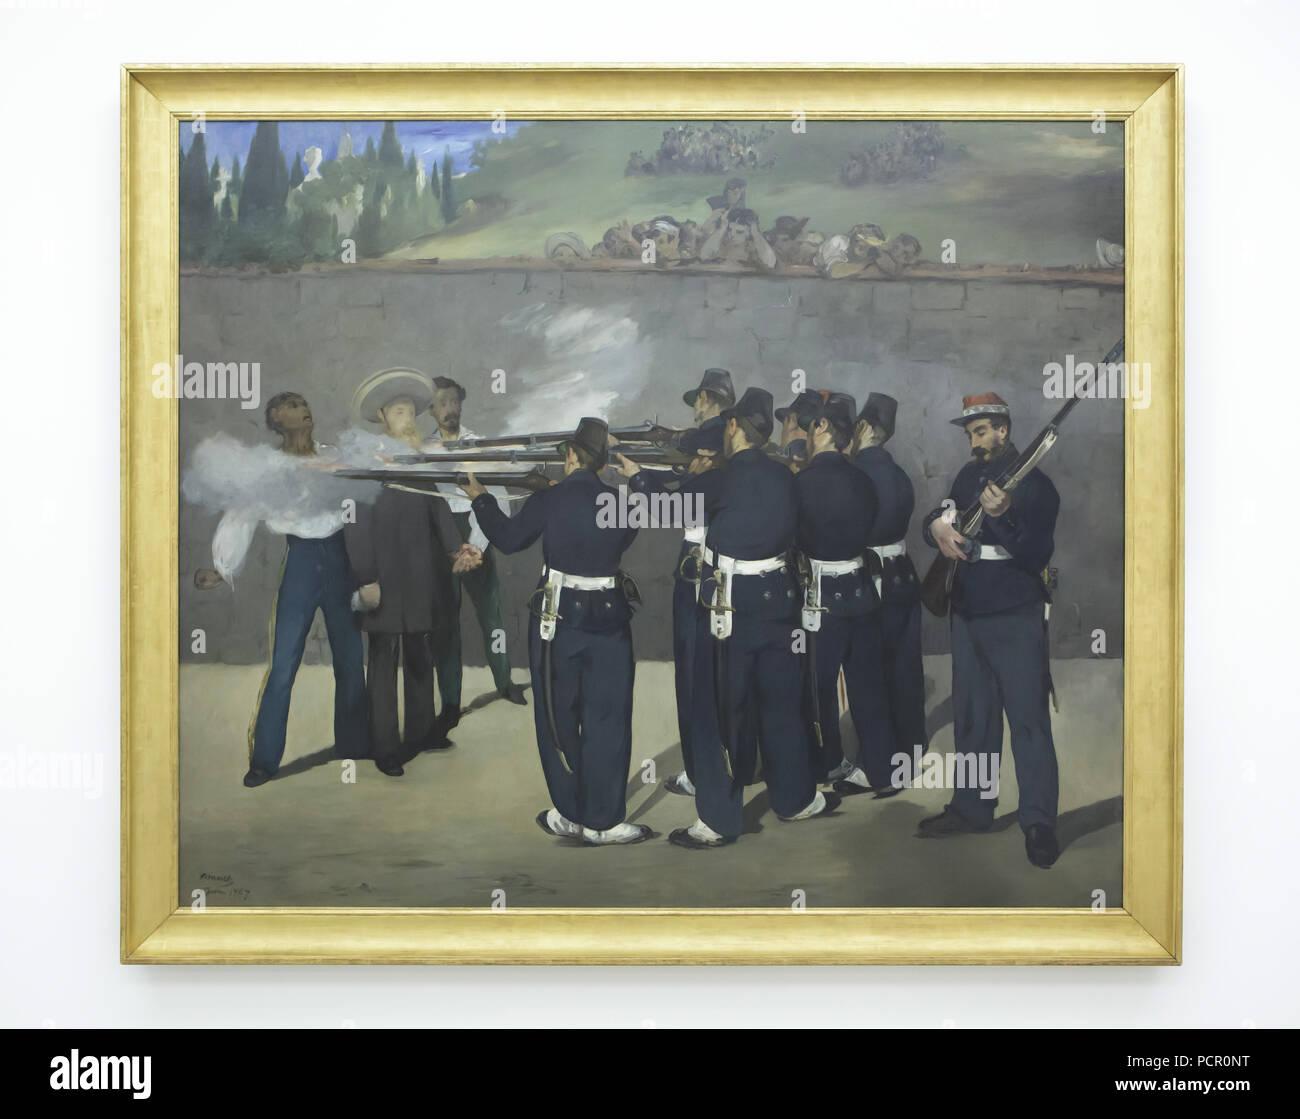 Dipinto 'l'esecuzione dell'Imperatore Massimiliano' dal francese pittore impressionista Édouard Manet (1868-1869) sul display nella Kunsthalle di Mannheim in Mannheim, Baden-Württemberg, Germania. Immagini Stock